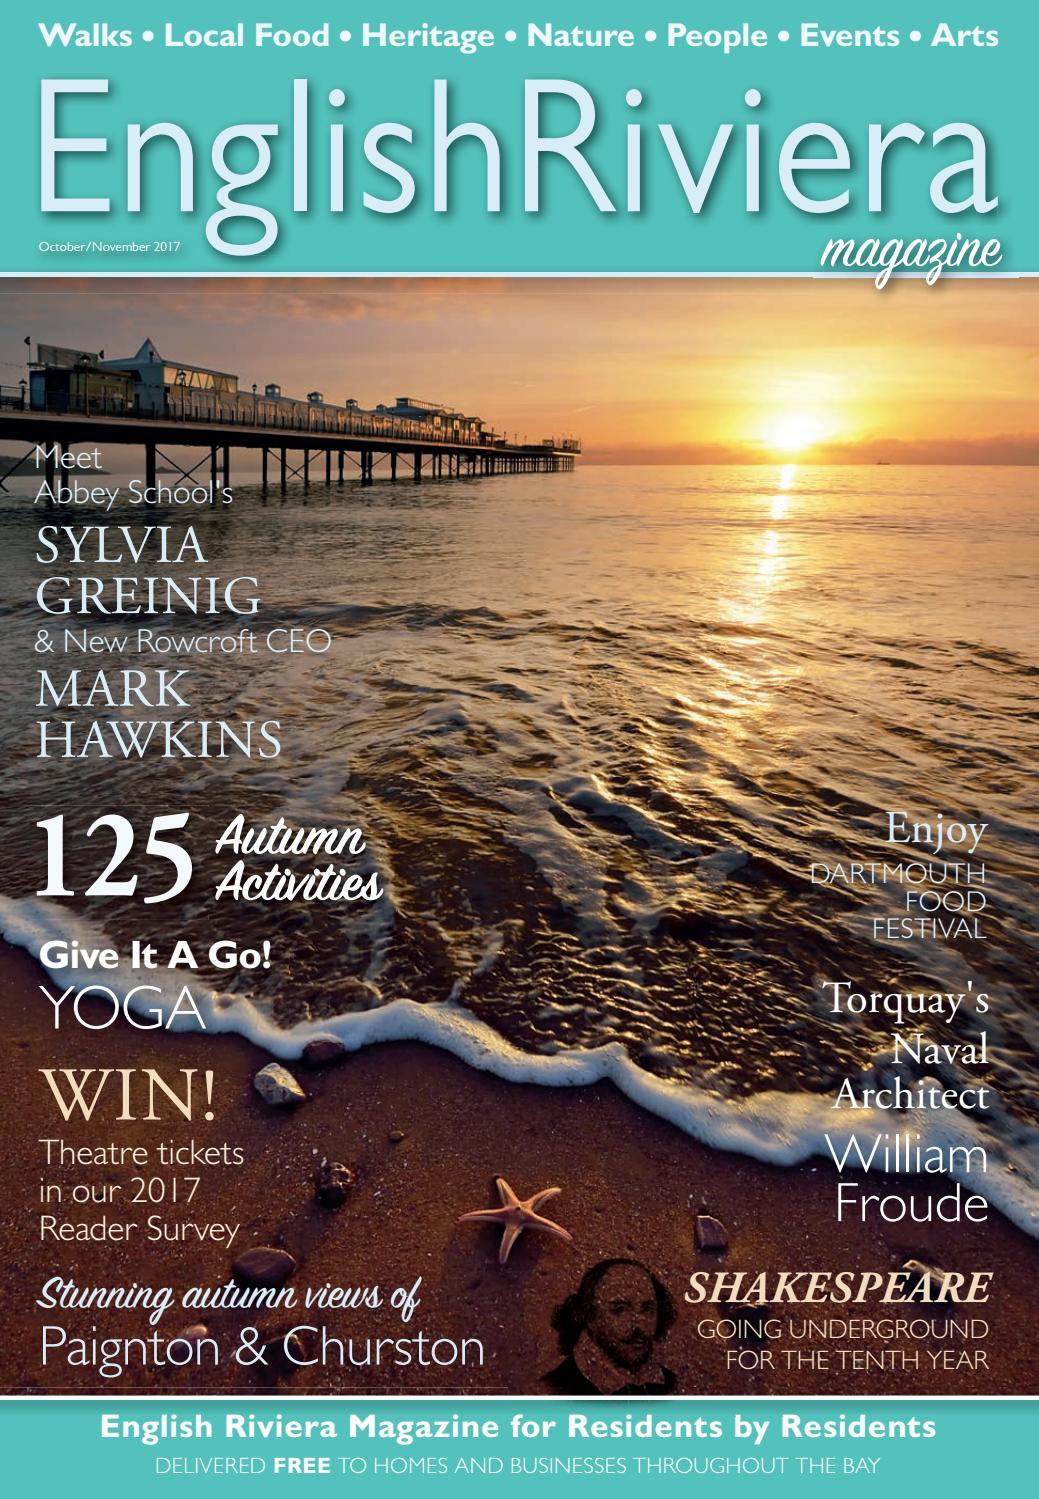 English Riviera Magazine Oct_Nov 17 Online by English